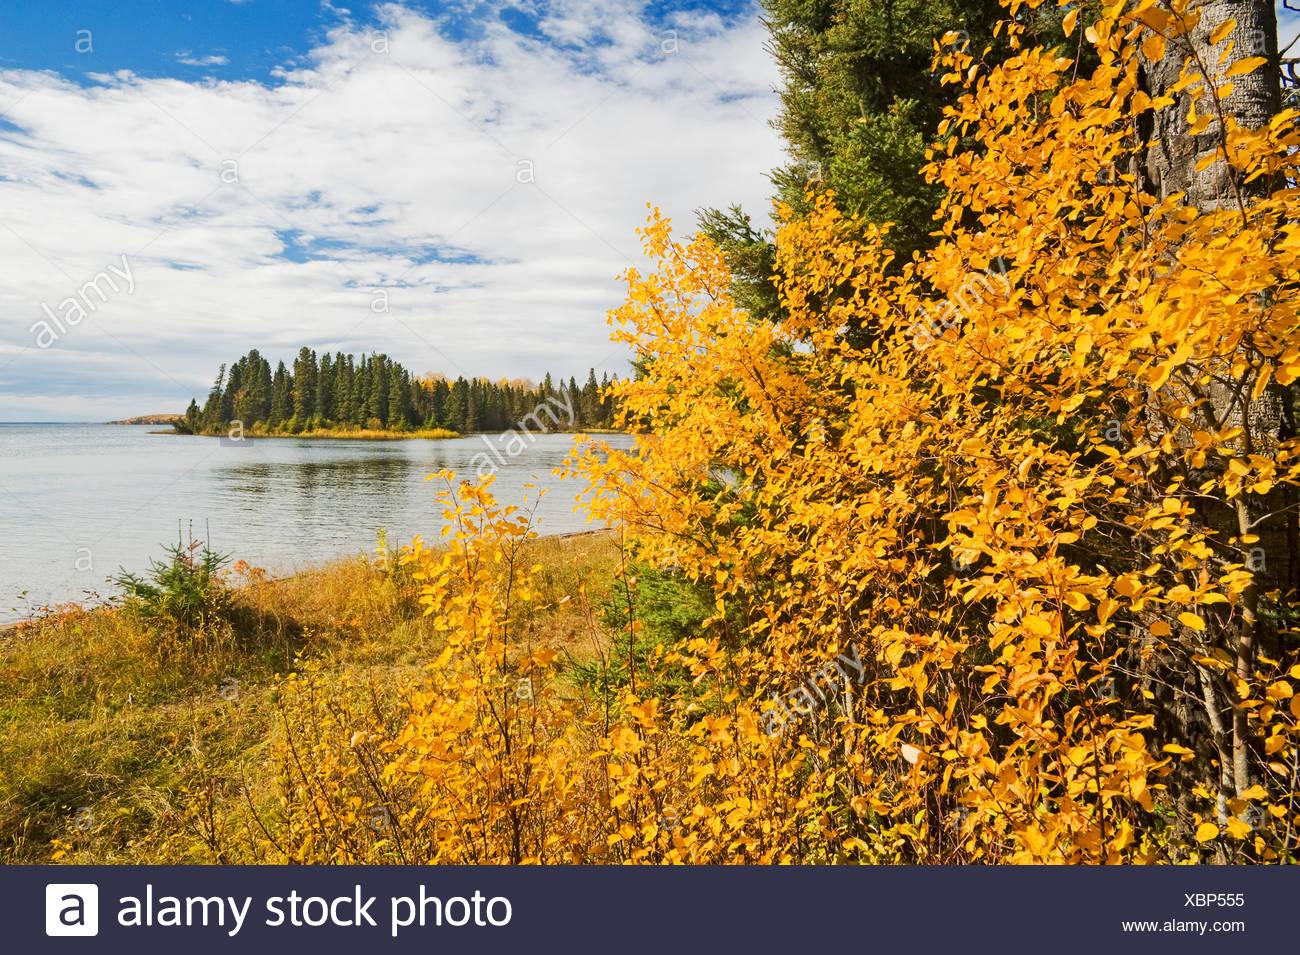 Waskasiu Lake, Prince Albert National Park, Saskatchewan, Canada - Stock Image